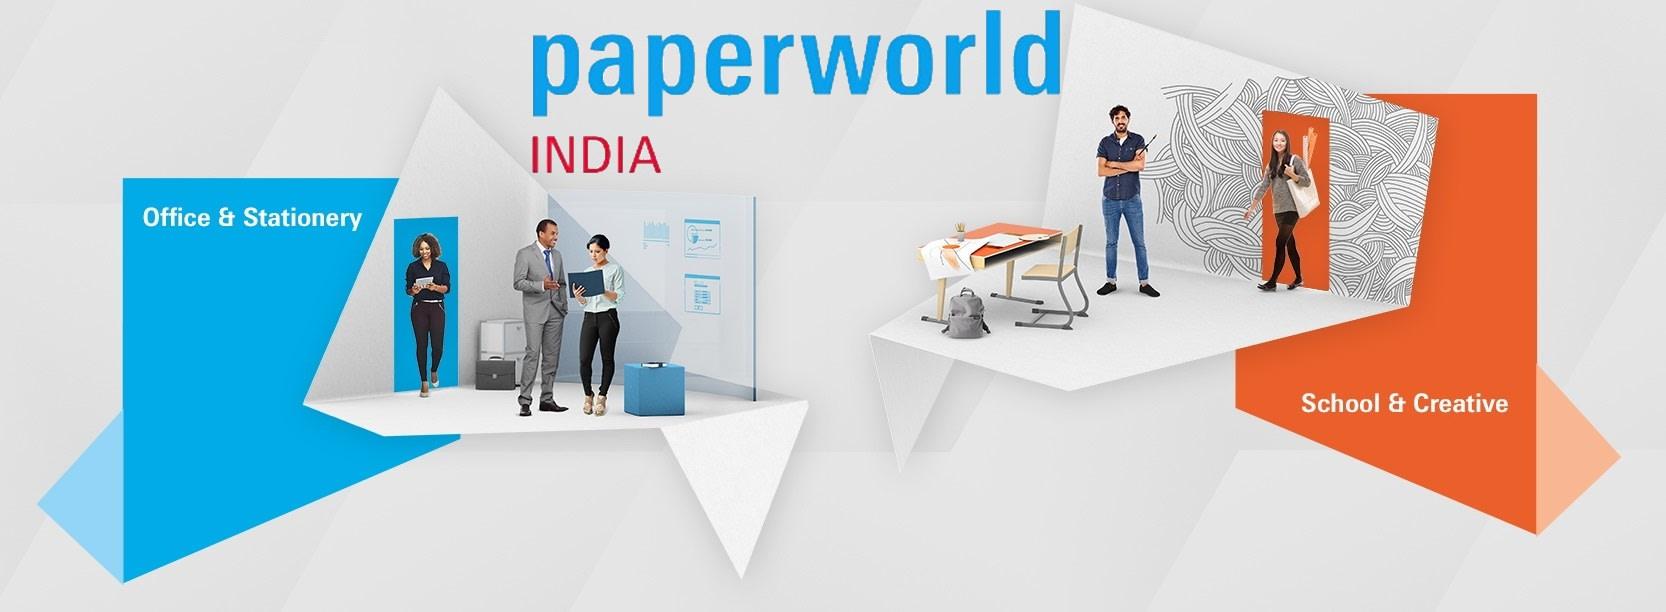 Paperworld India